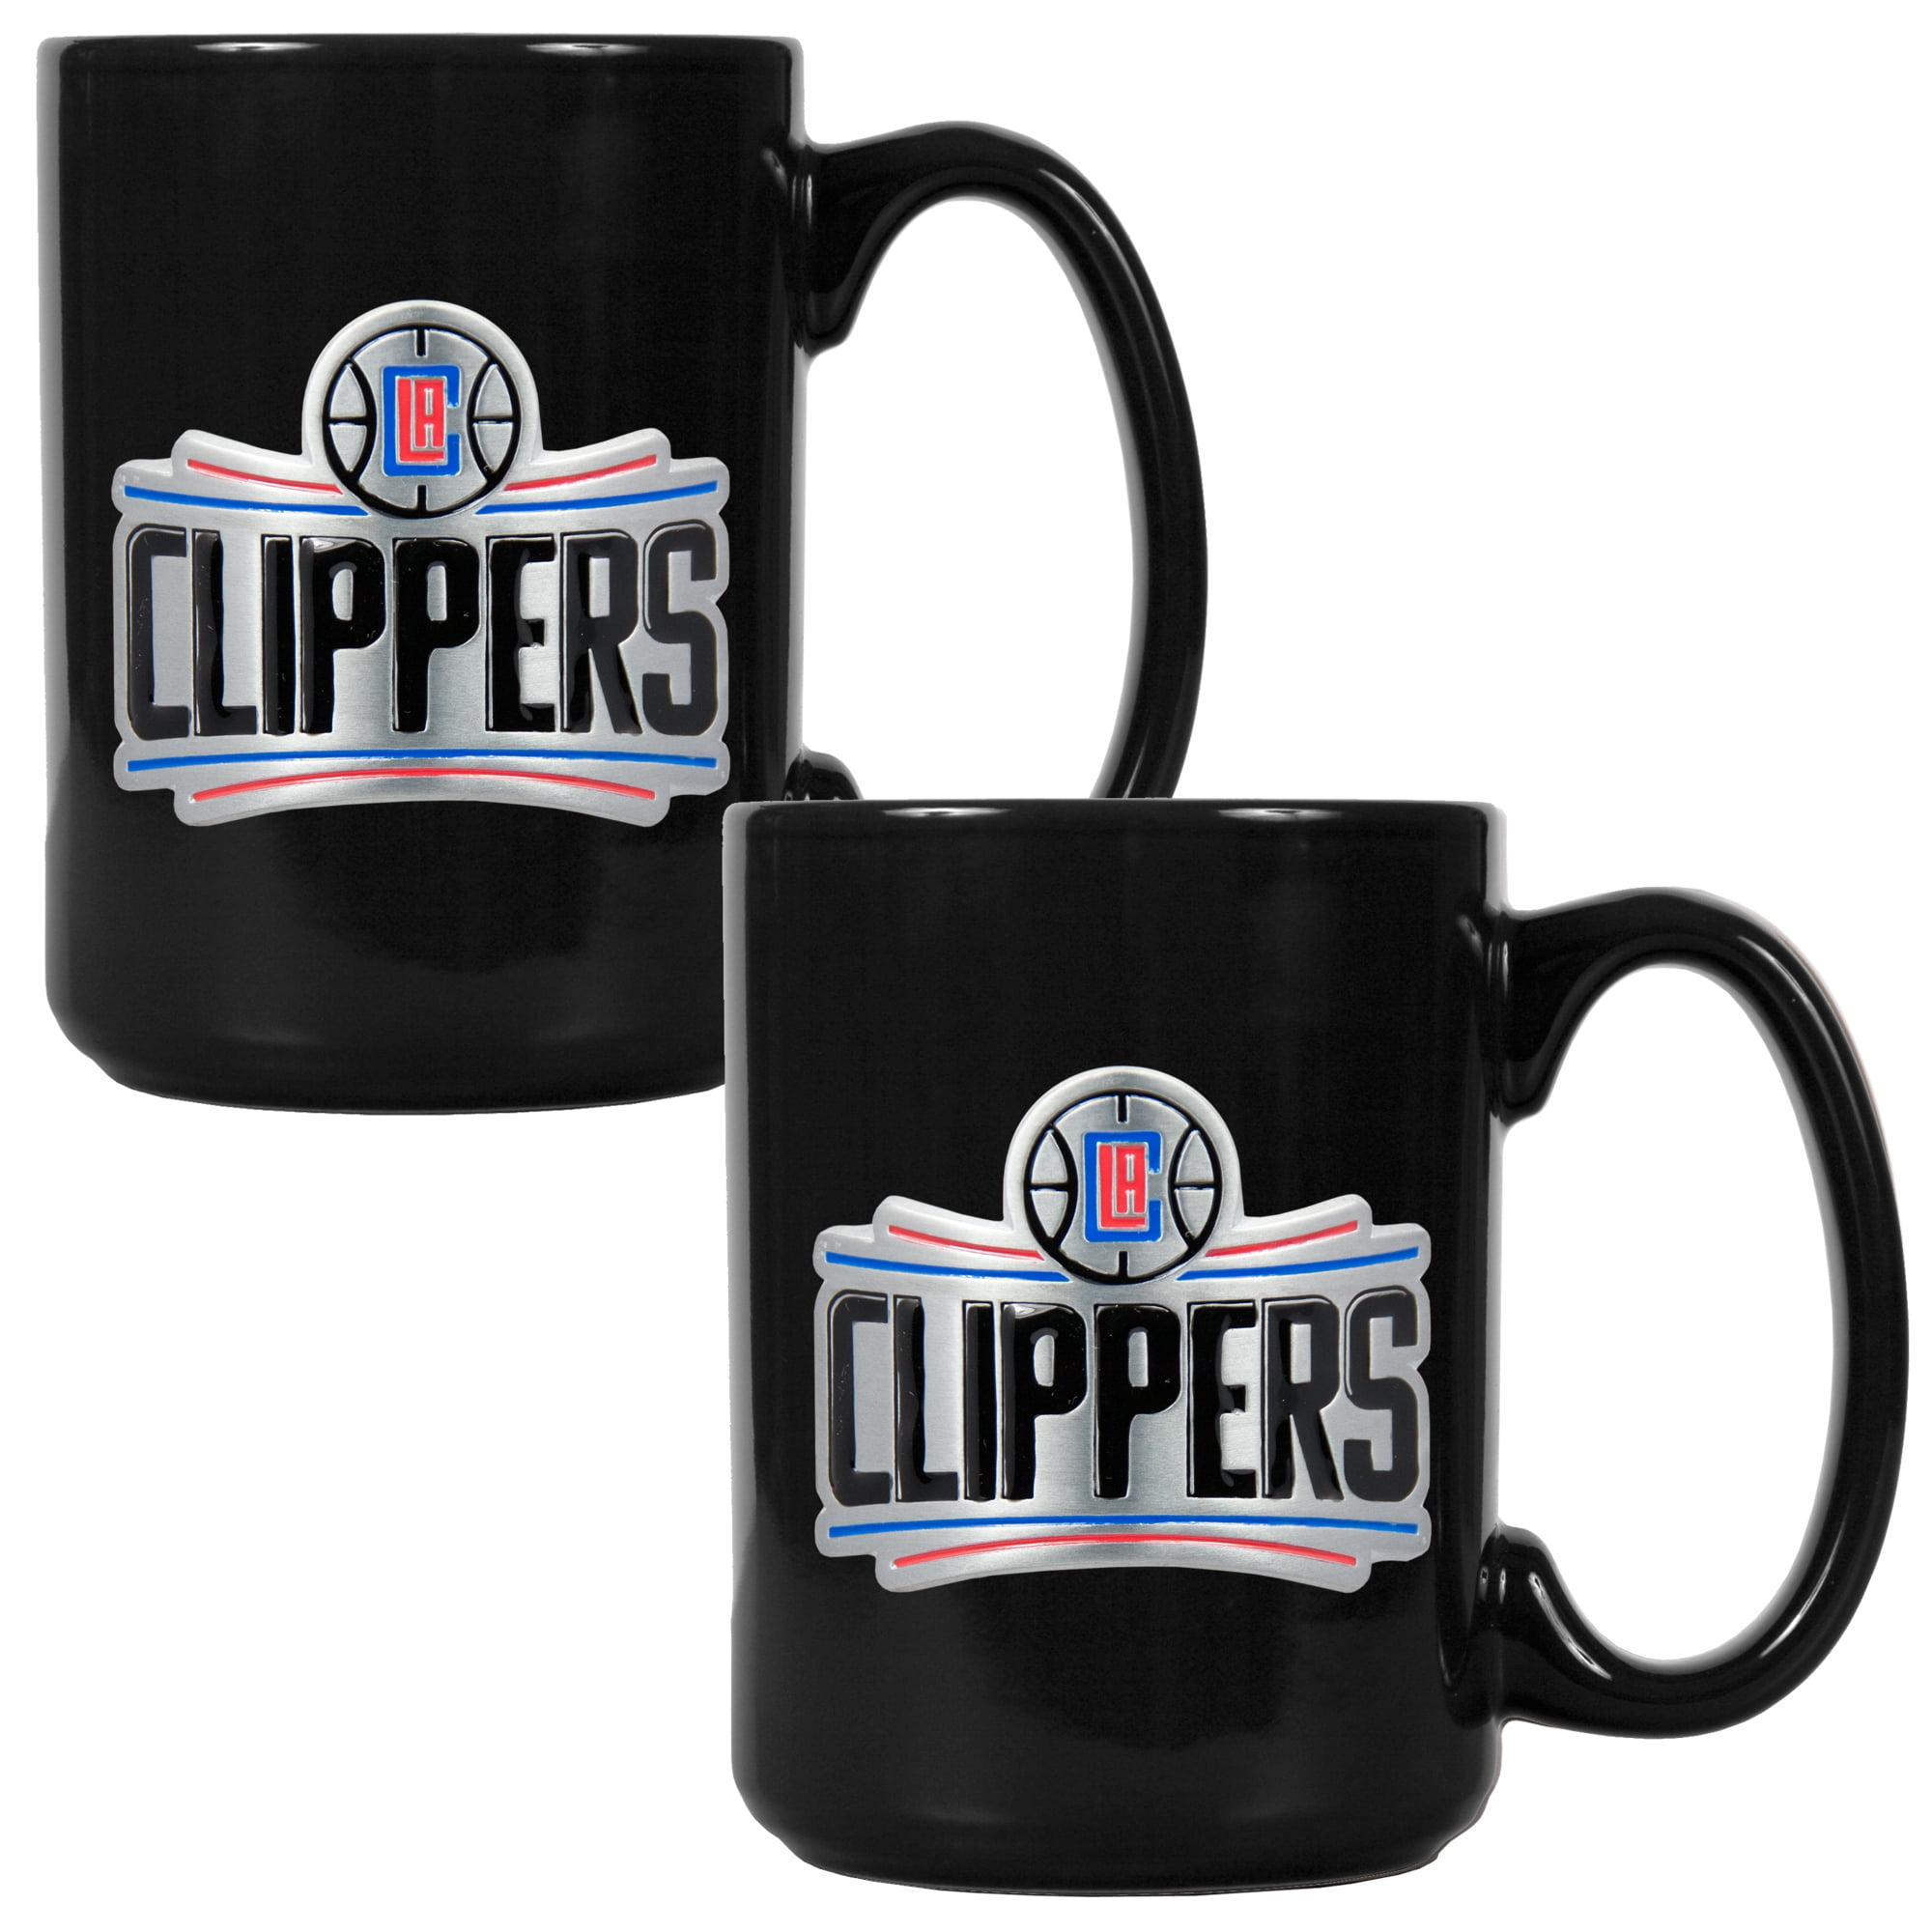 LA Clippers 15oz. Coffee Mug Set - Black - No Size